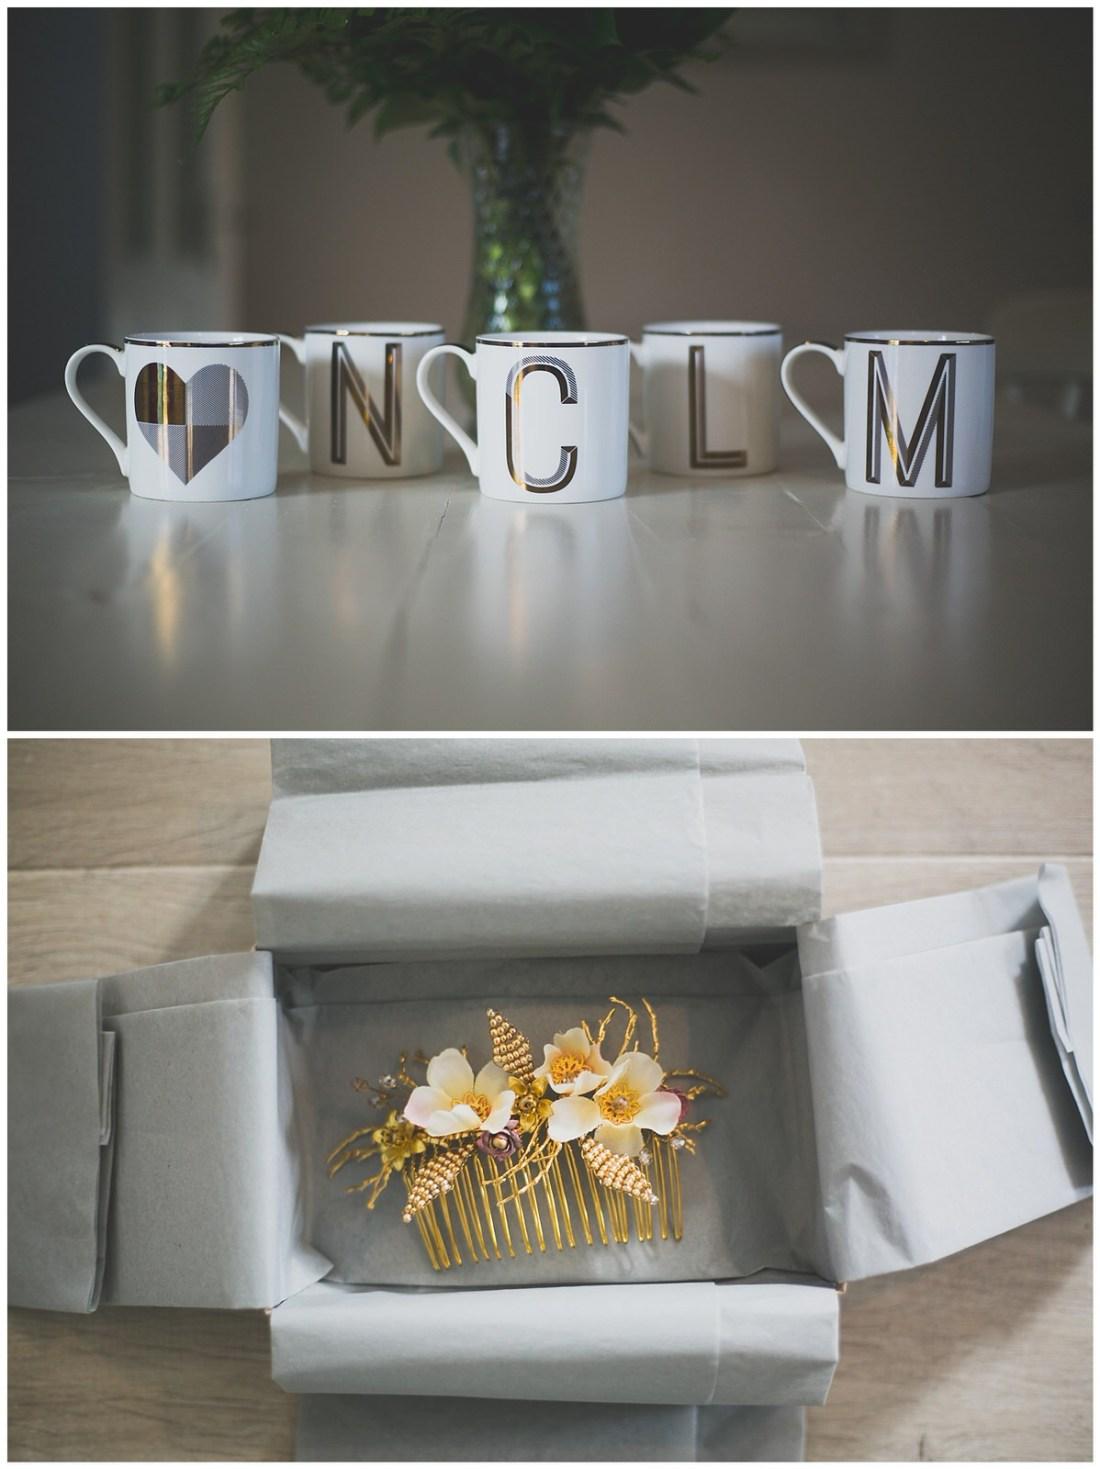 Cute bridesmaids gift of initialled mugs